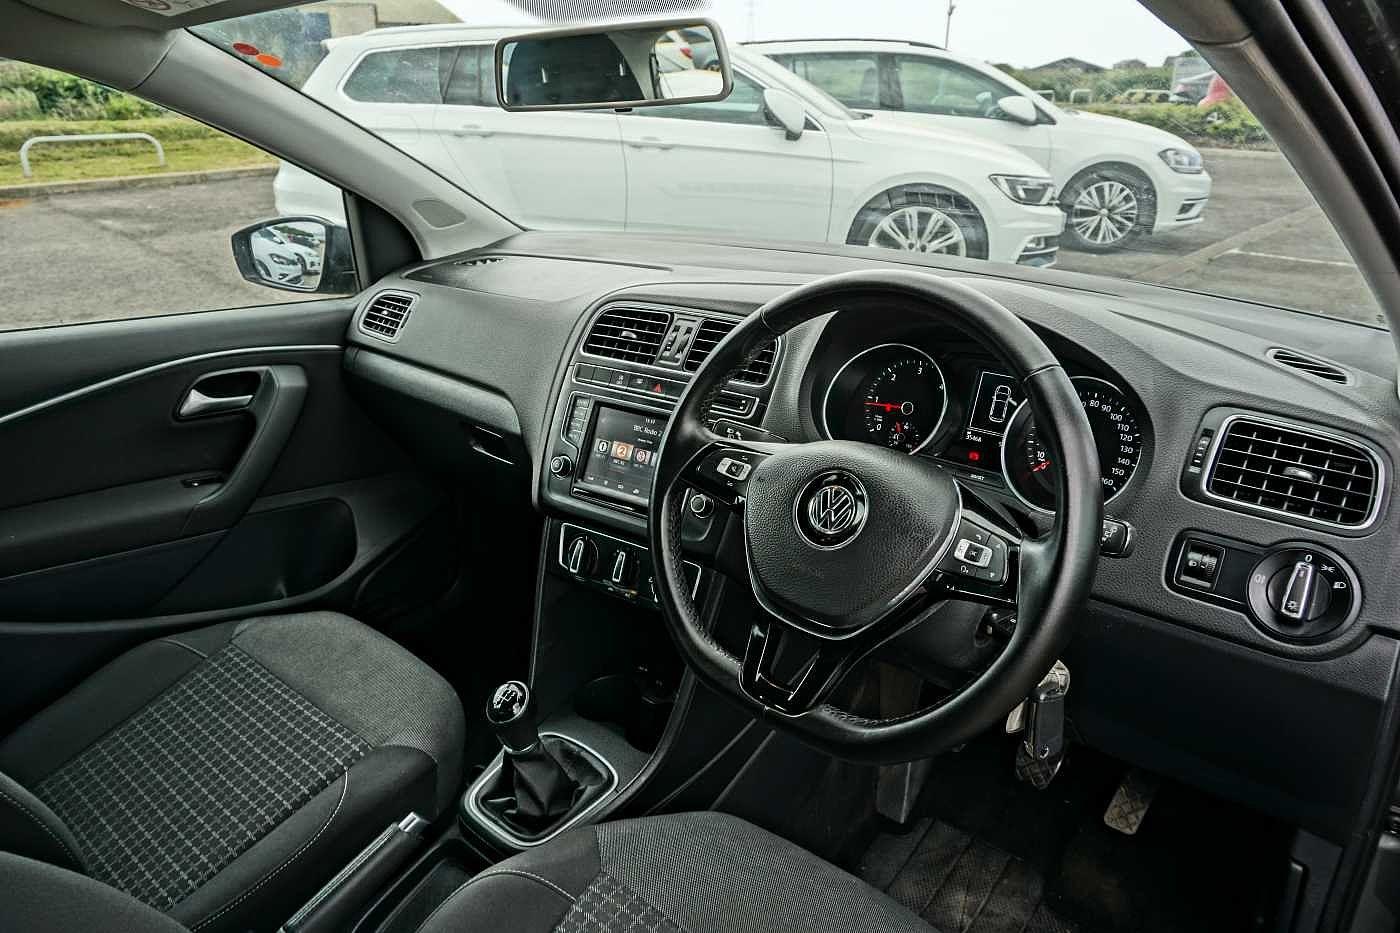 Volkswagen Polo 1.4 TDI SE 75PS 5Dr